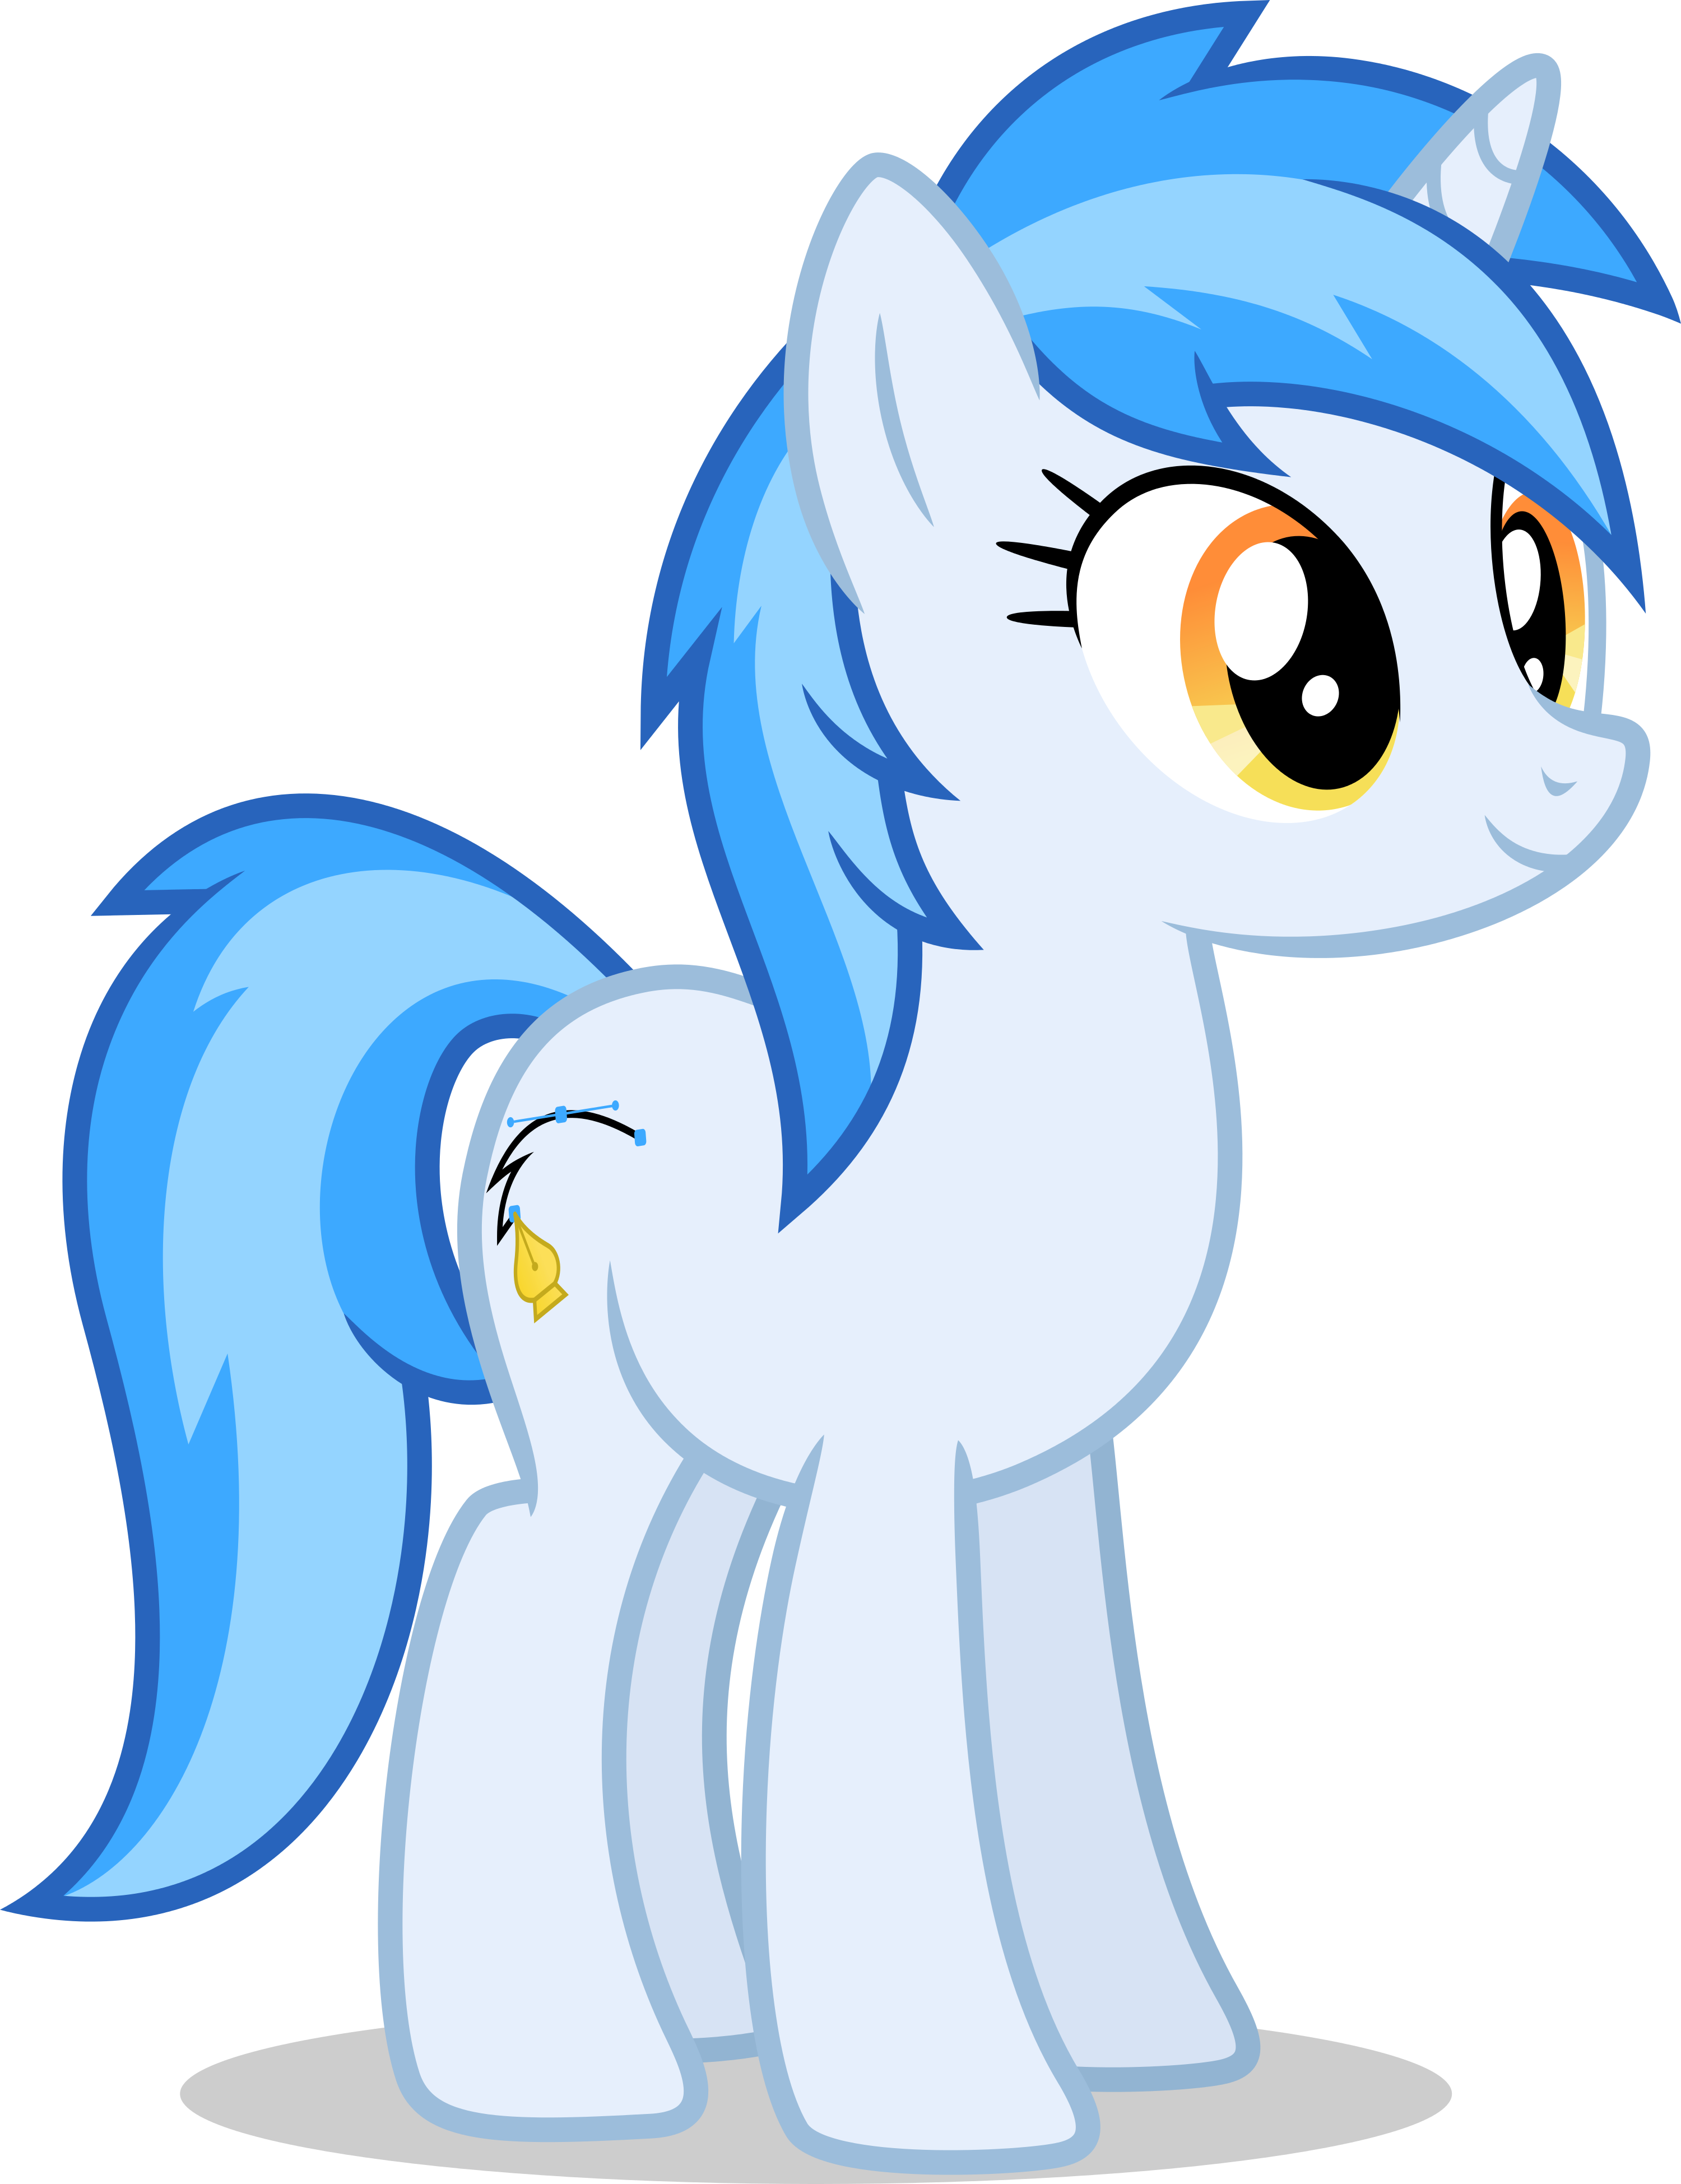 Penny Curve (MLP-VectorClub Mascot 2.0) by Ambassad0r